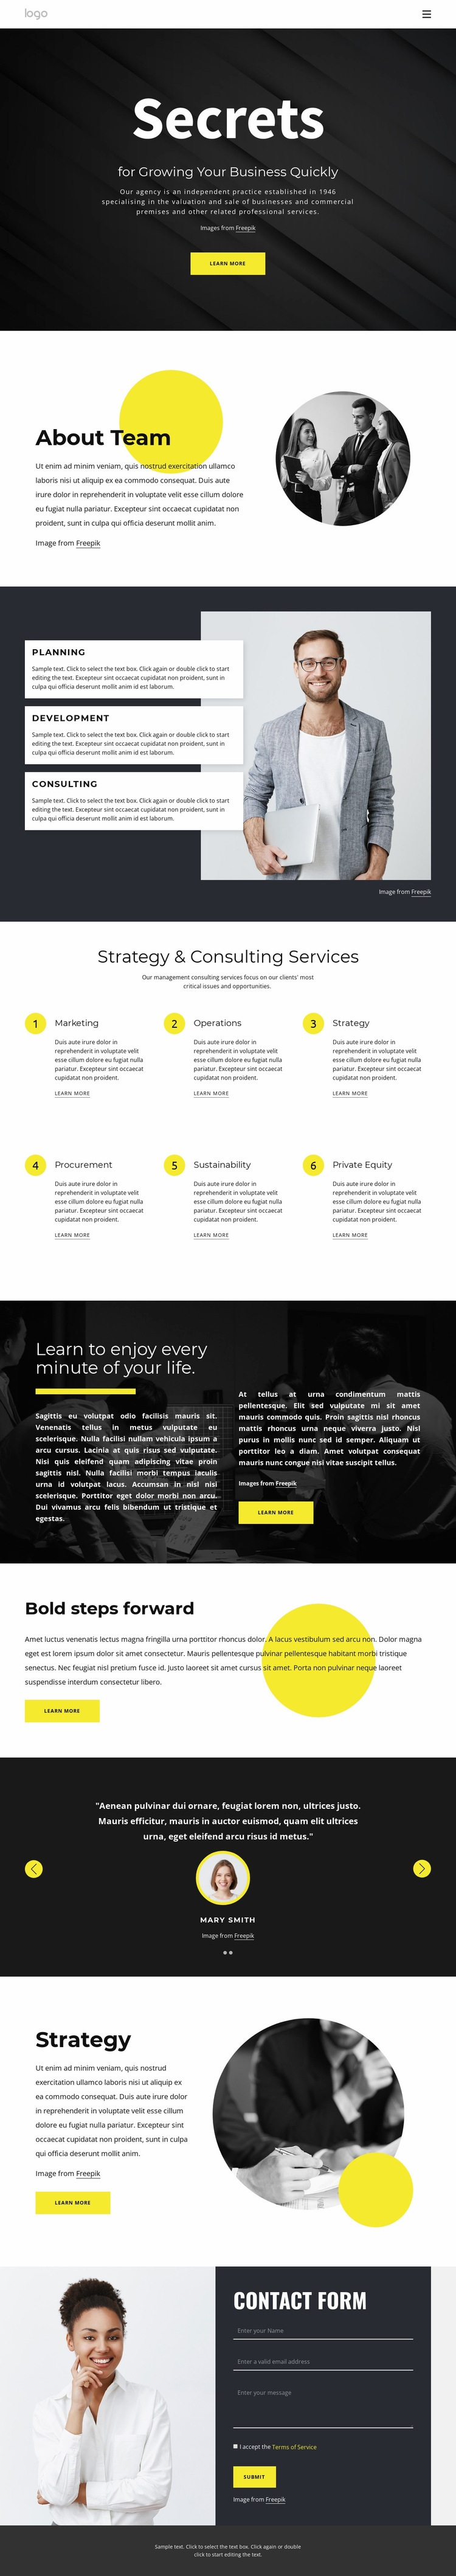 Secrets of growing business Web Page Designer